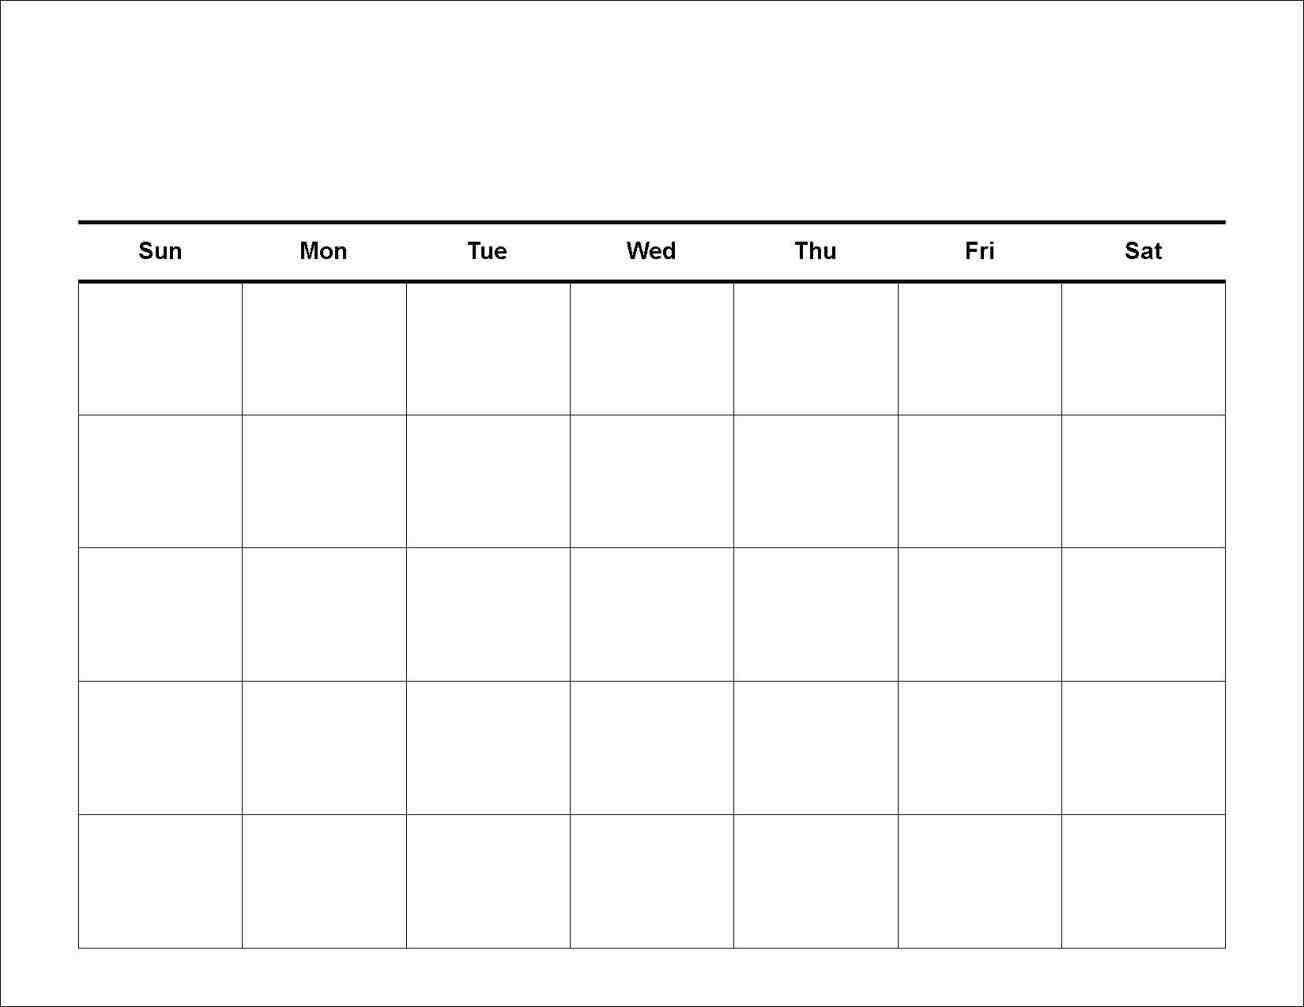 003 Day Calendar Template Surprising 7 Ideas Printable Appointment for 7 Day Calendar Template Printable